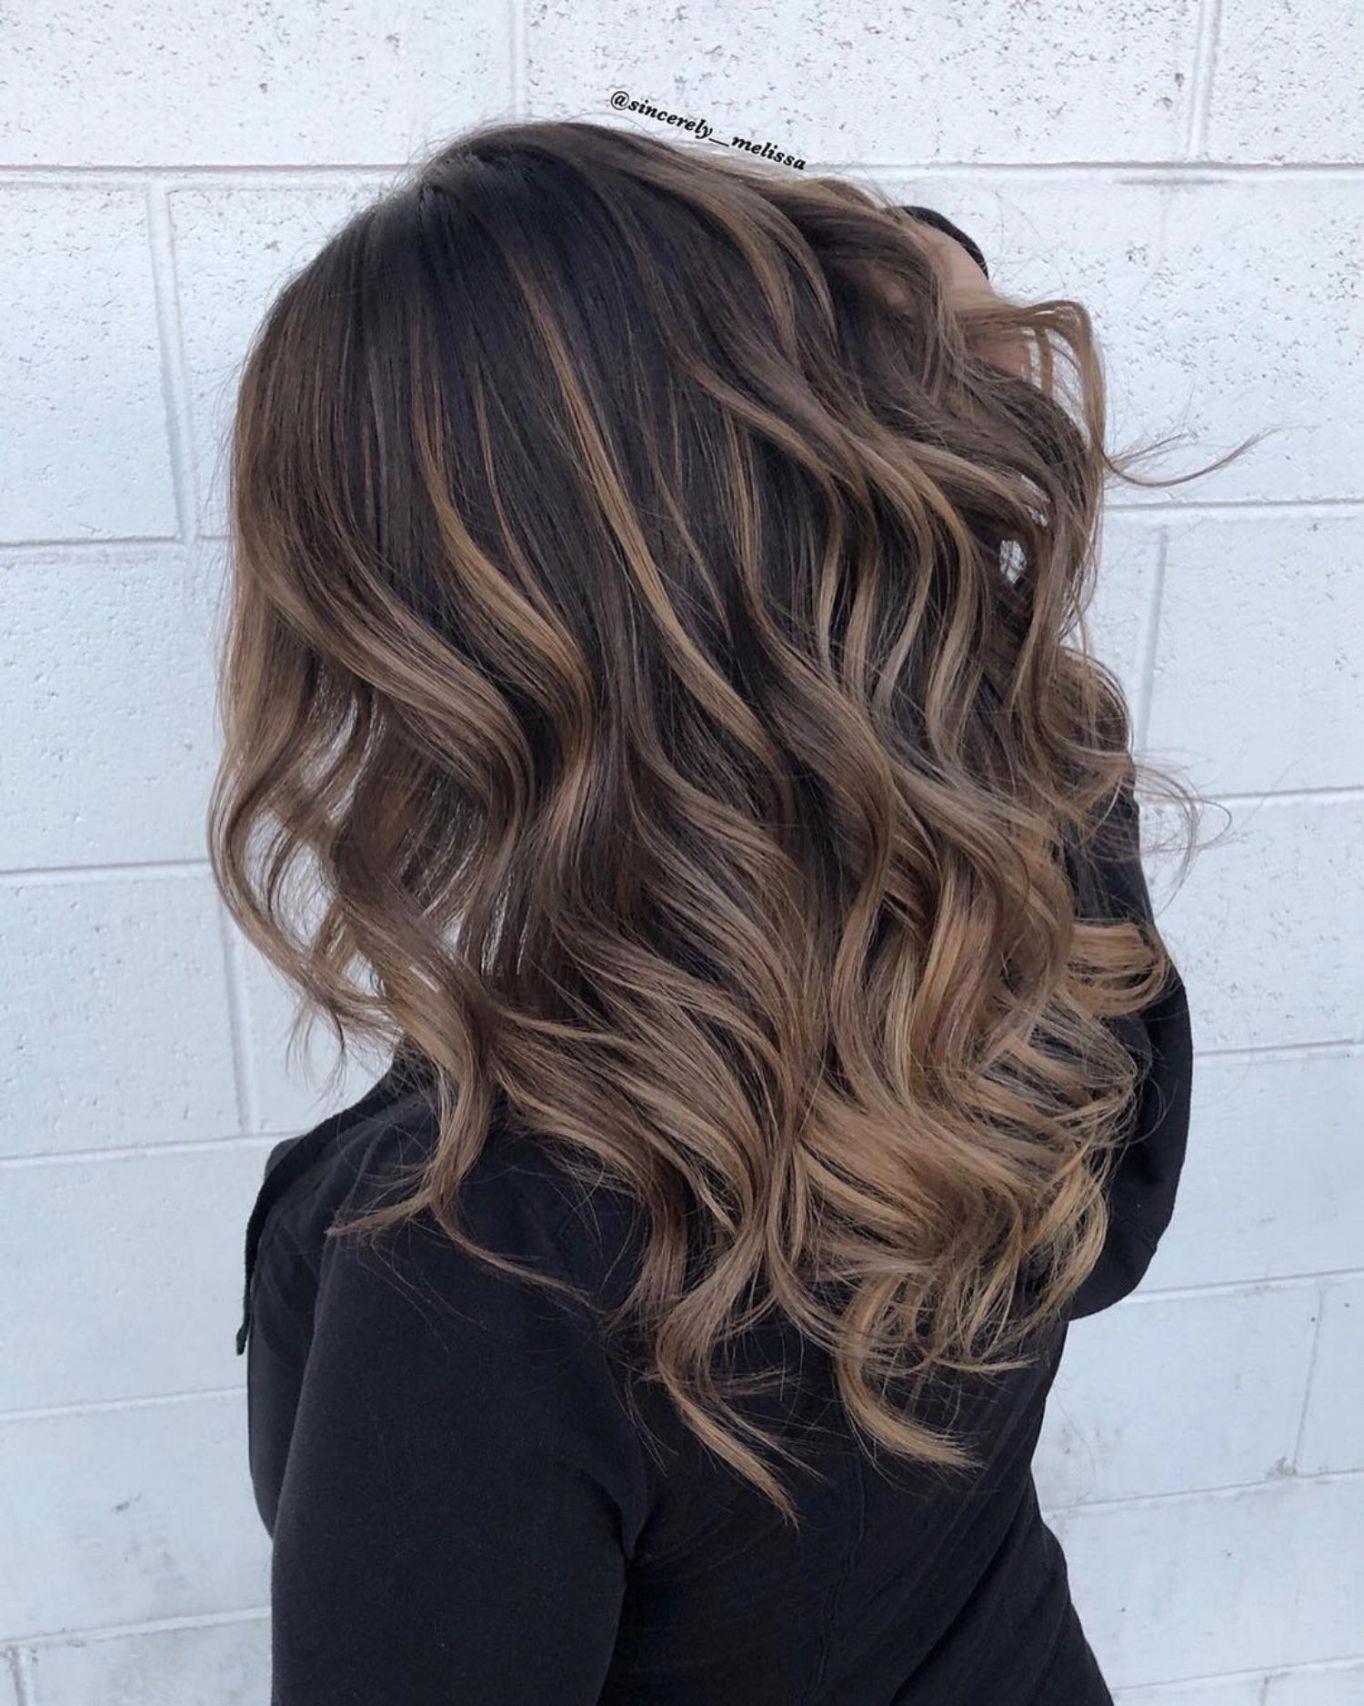 60 Hairstyles Featuring Dark Brown Hair With Highlights Dark Hair With Highlights Brown Hair Balayage Brown Blonde Hair